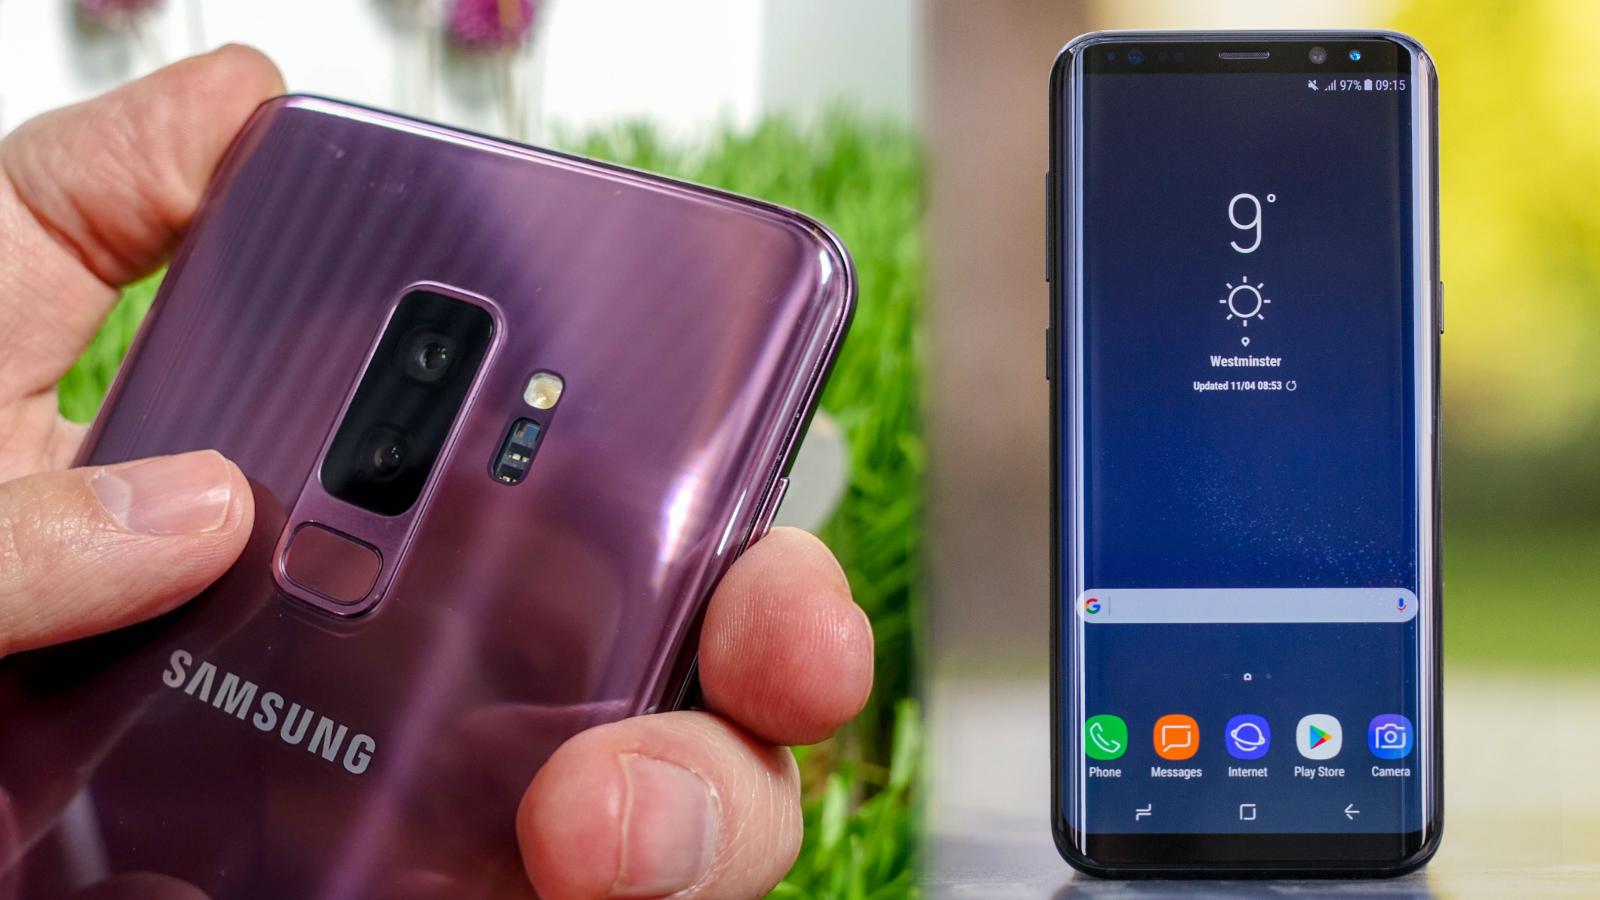 Samsung Galaxy S9 Plus vs Samsung Galaxy S8 Plus | TechRadar